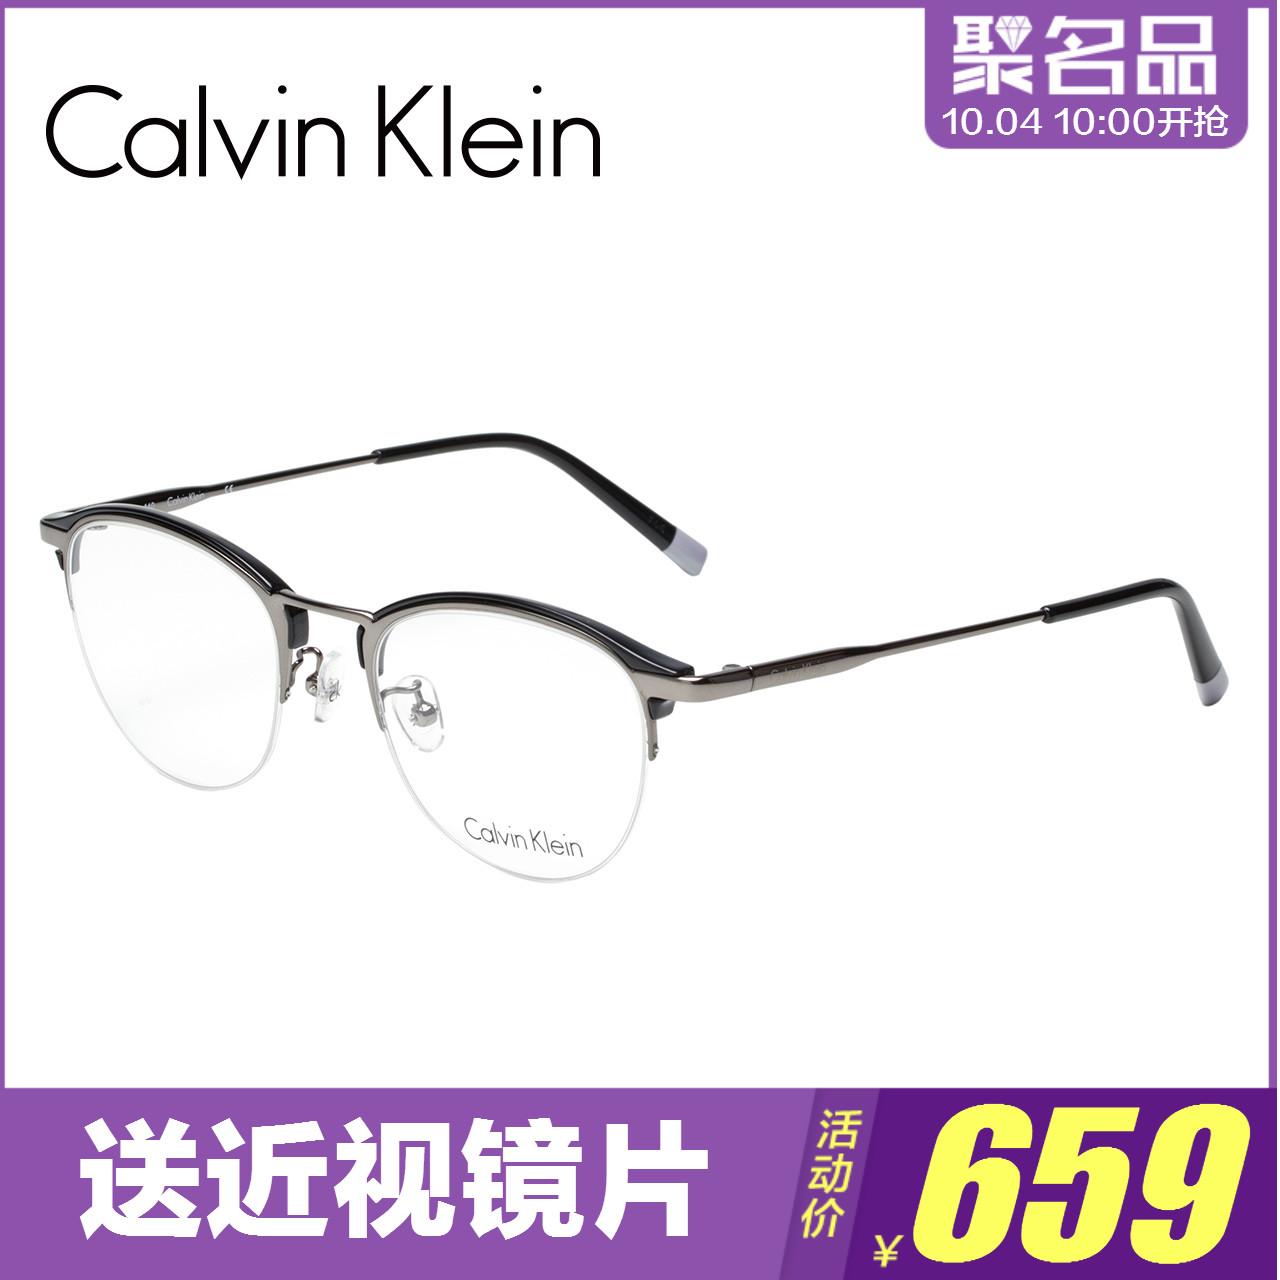 Calvin Klein近视眼镜框 文艺复古半框金属男女配镜眼镜架 CK5465